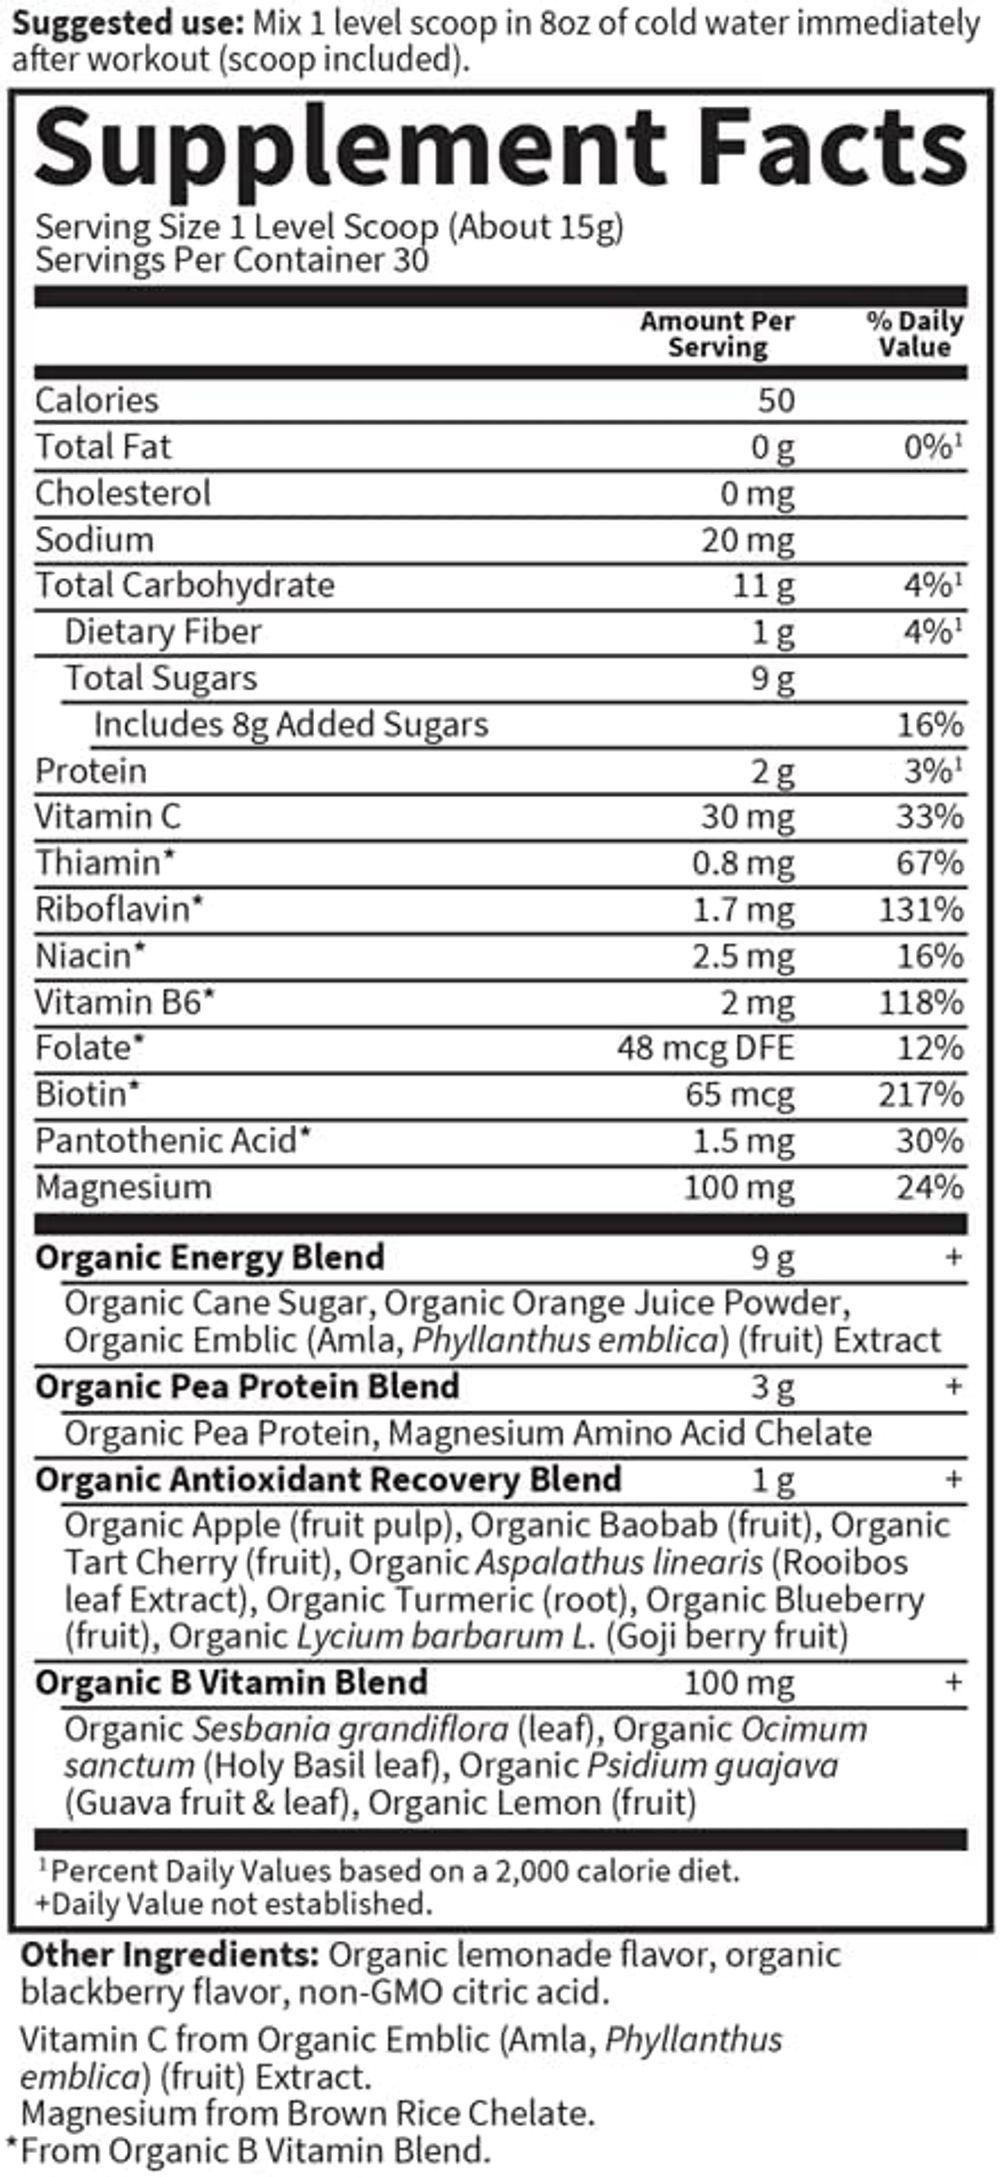 Garden of Life Sport Vegan Organic Plant Based Post Workout Muscle Recovery Powder for Men & Women - BlackBerry Lemonade 30 Servings, 100mg Magnesium, Antioxidants, Supplements, 15.7 Oz